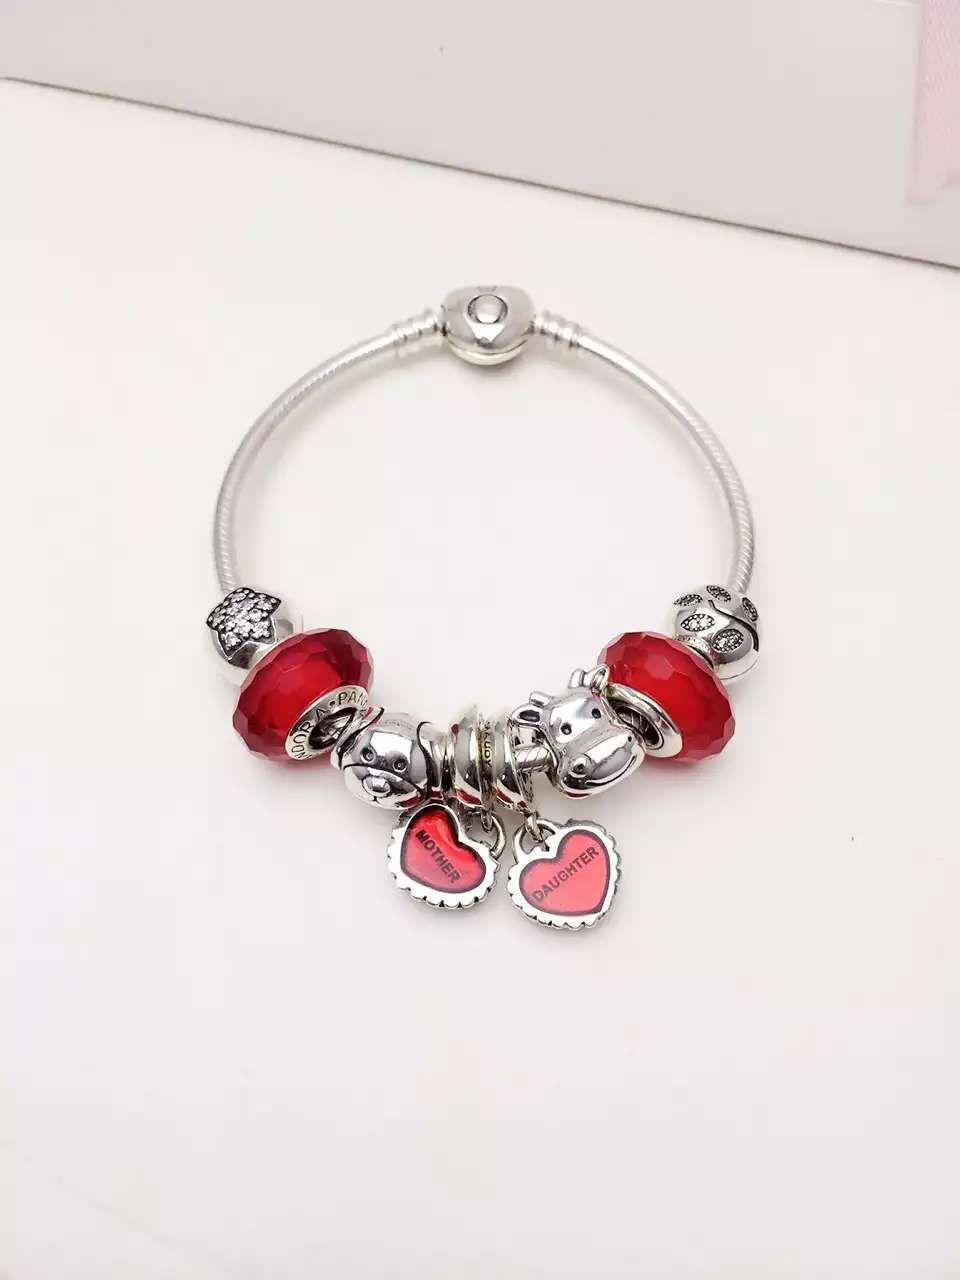 50% OFF!!! $199 Pandora Charm Bracelet Red. Hot Sale!!! SKU ...